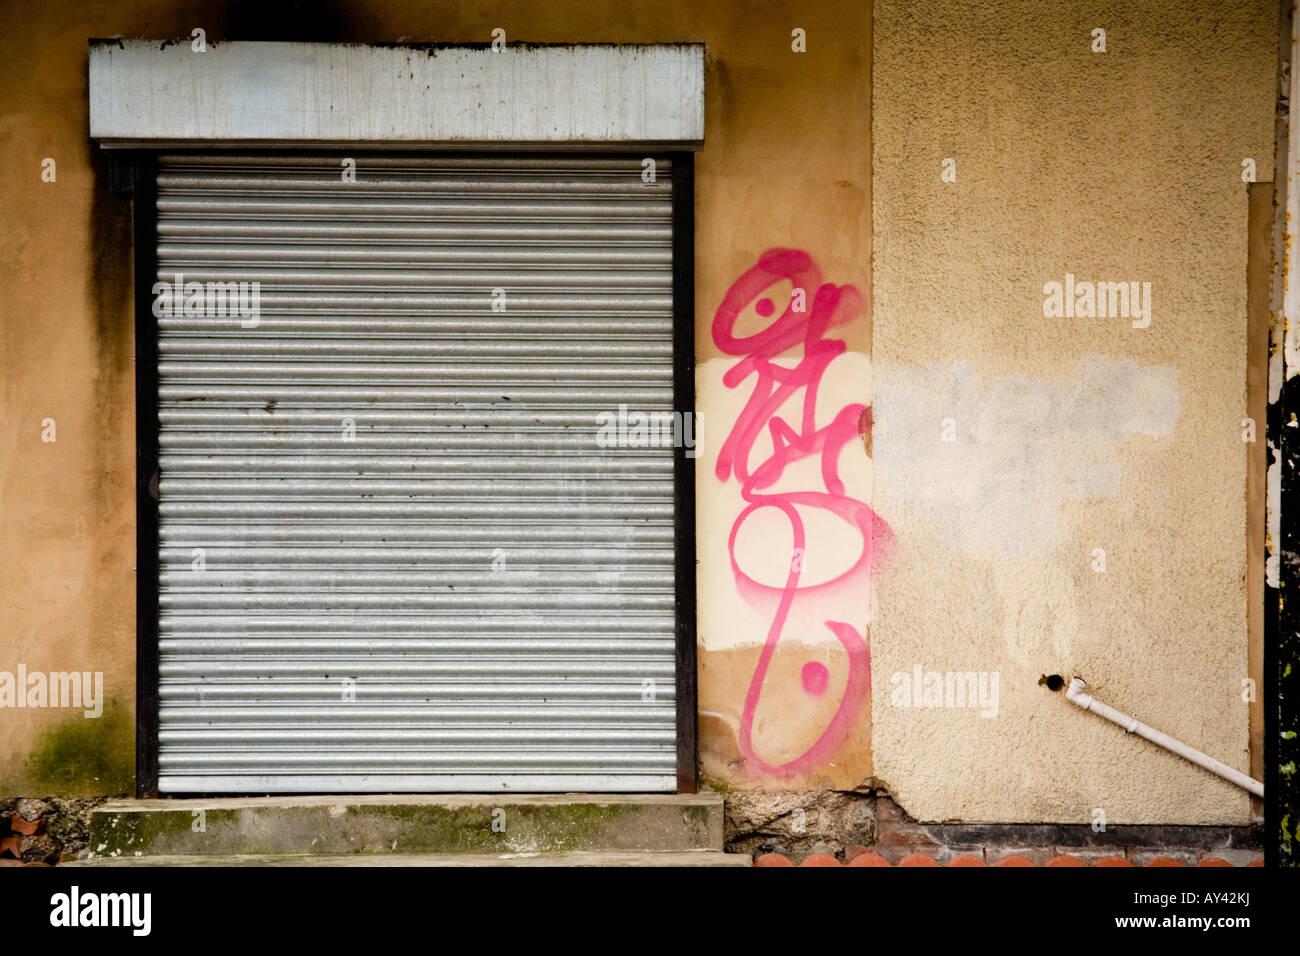 Garage Door Graffiti Stock Photos Garage Door Graffiti Stock